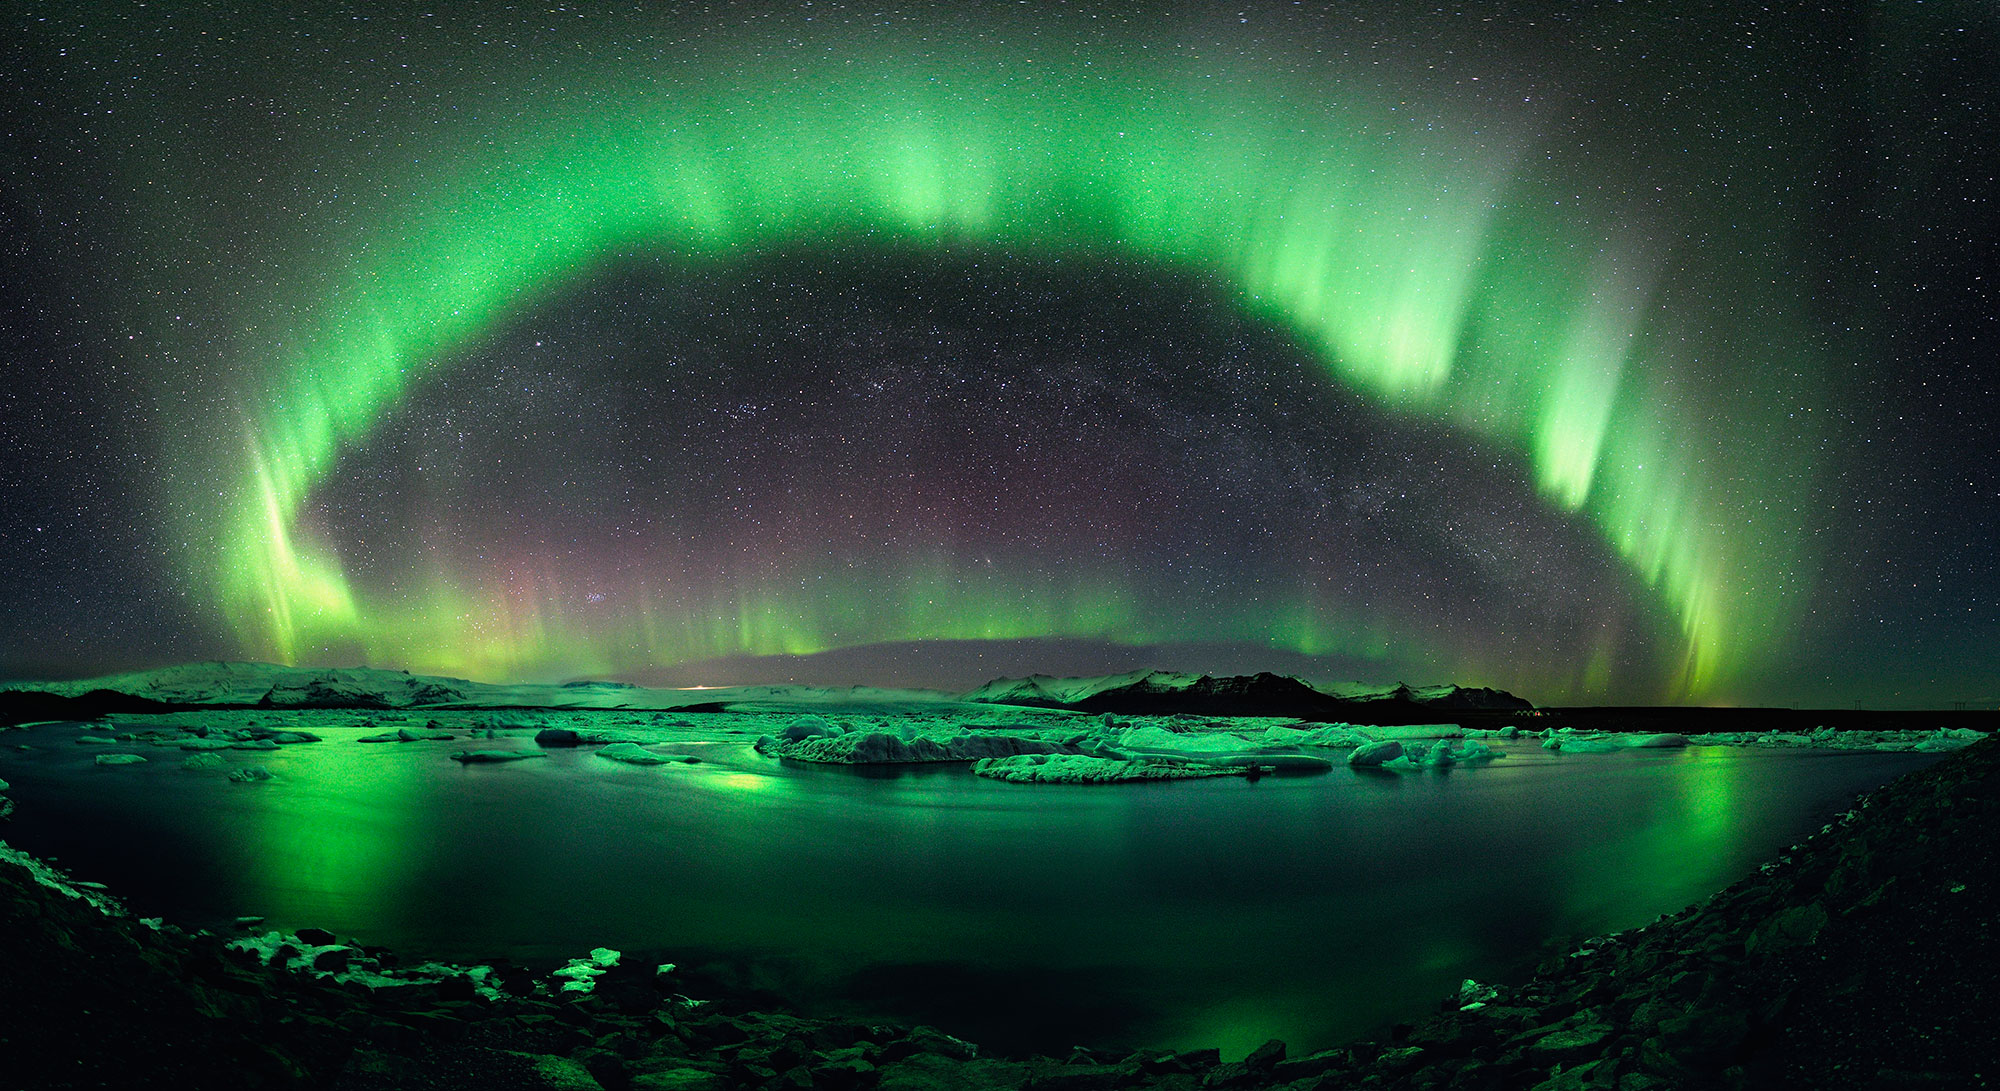 Espectacular fenómeno de la Aurora Boreal